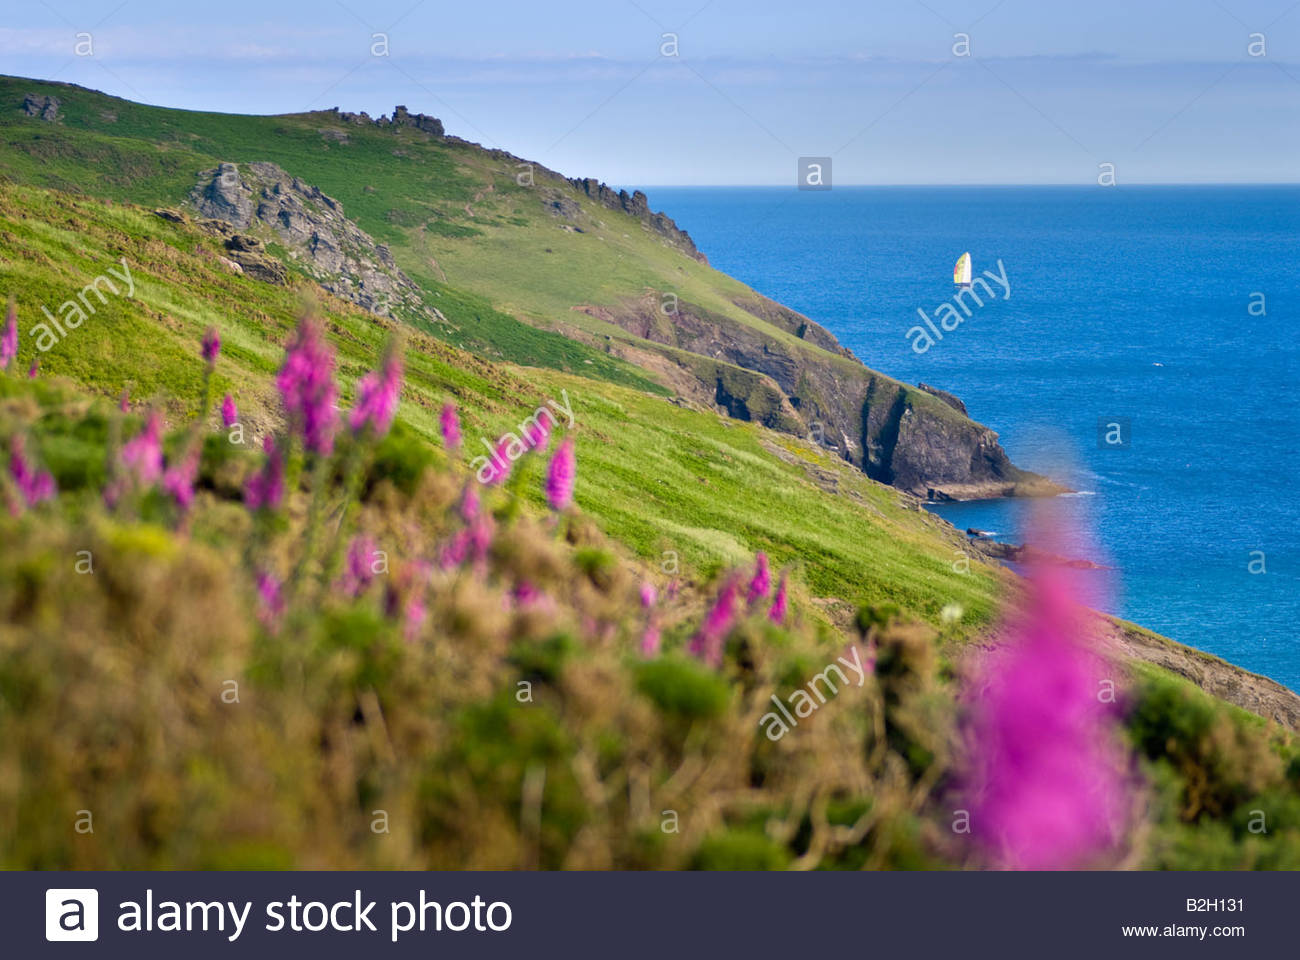 Foxgloves on the hillside near Soar Mill Cove, South Hams, South Devon, England. - Stock Image